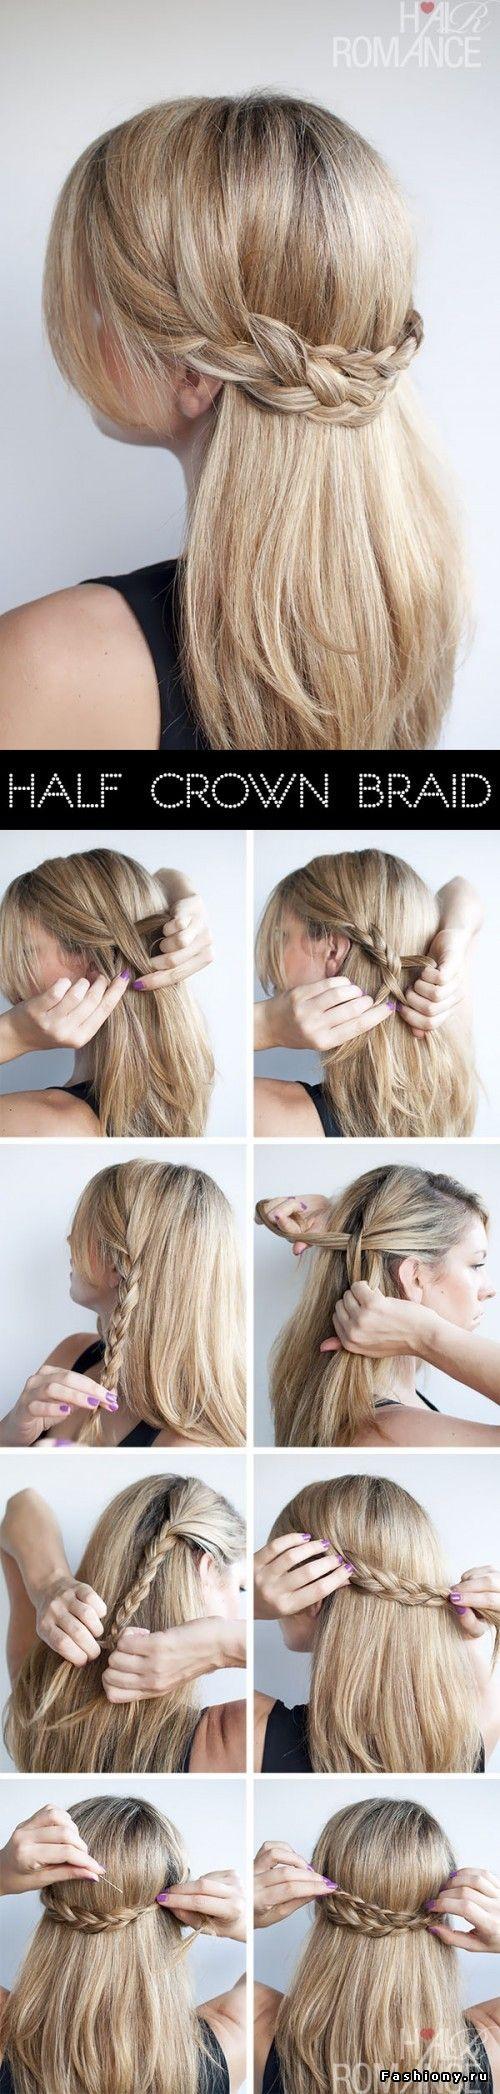 Half crown hairstyle, need long hair